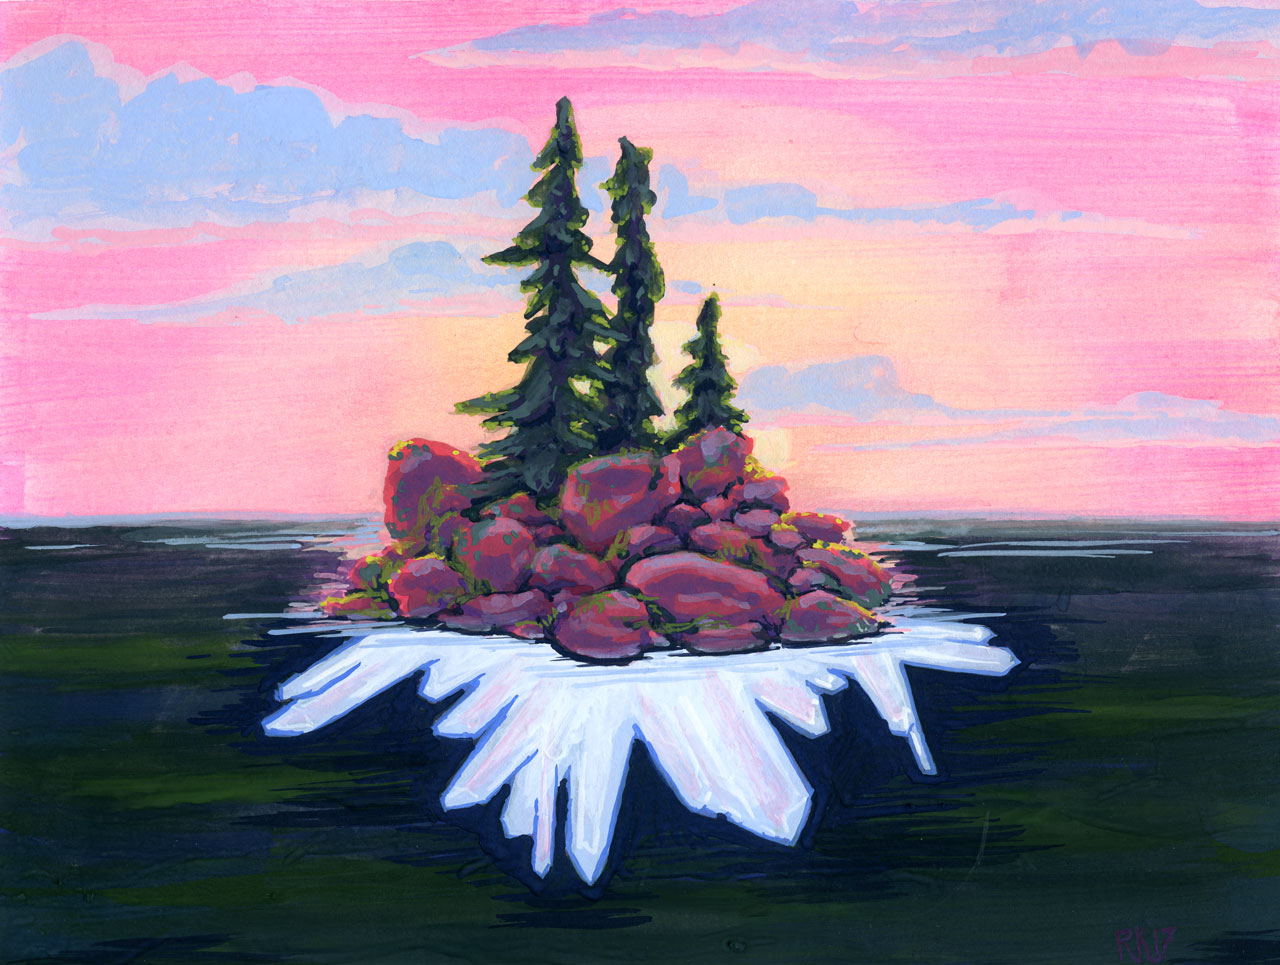 Sunset Crystal Island